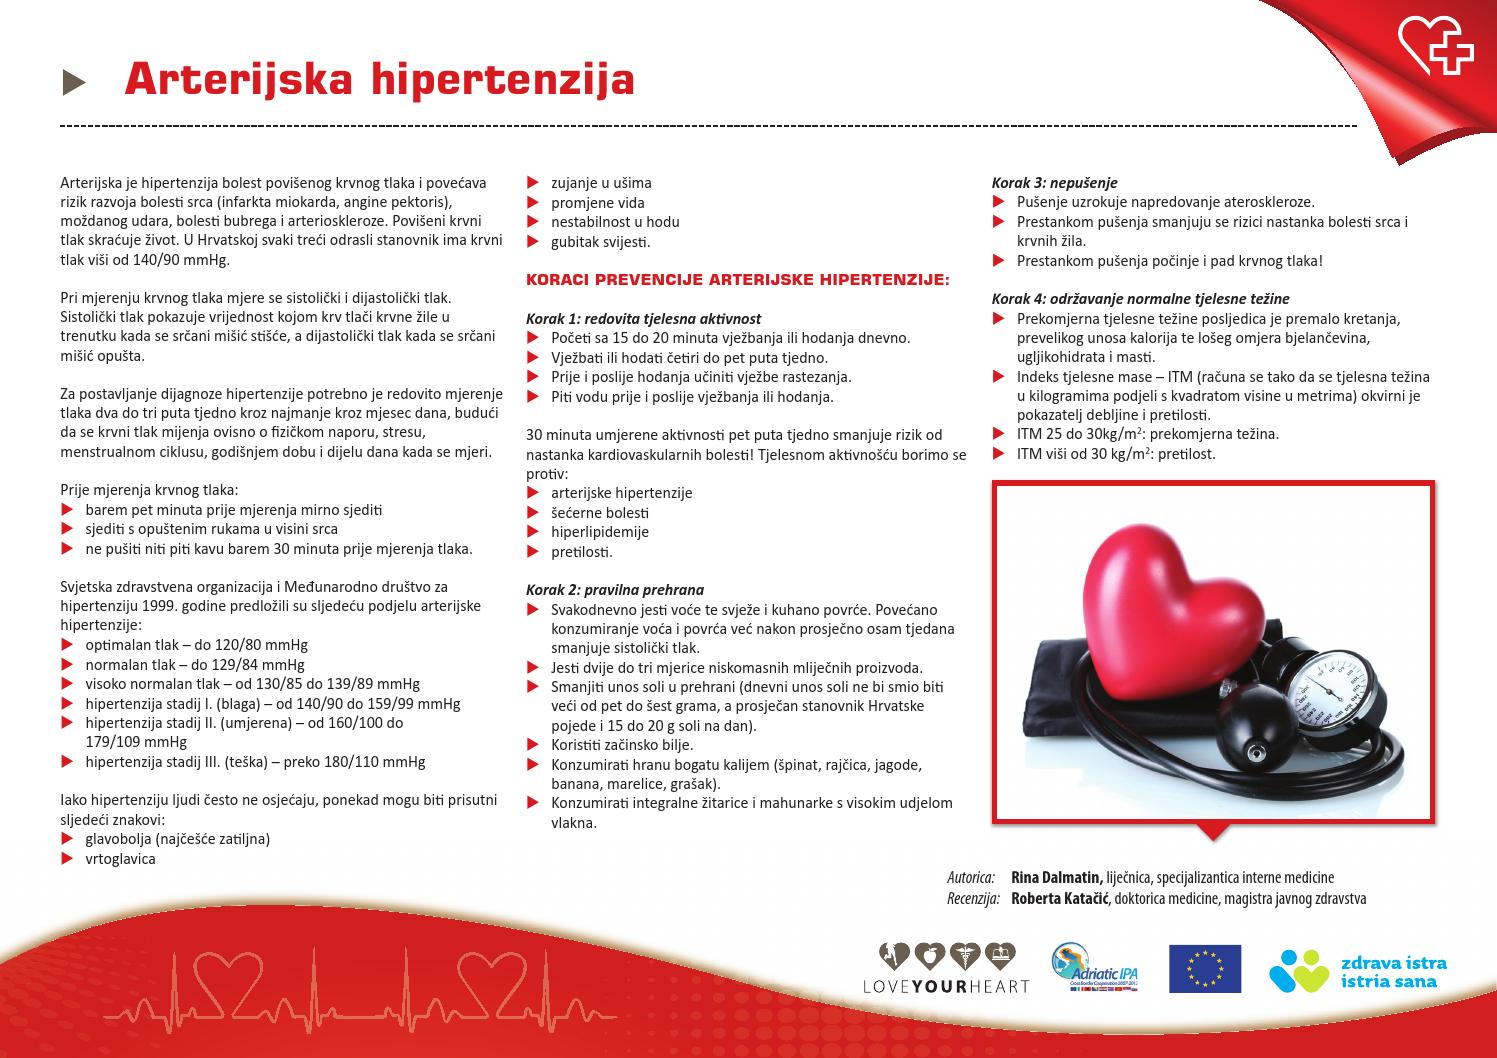 hipertenzija zobeno brašno